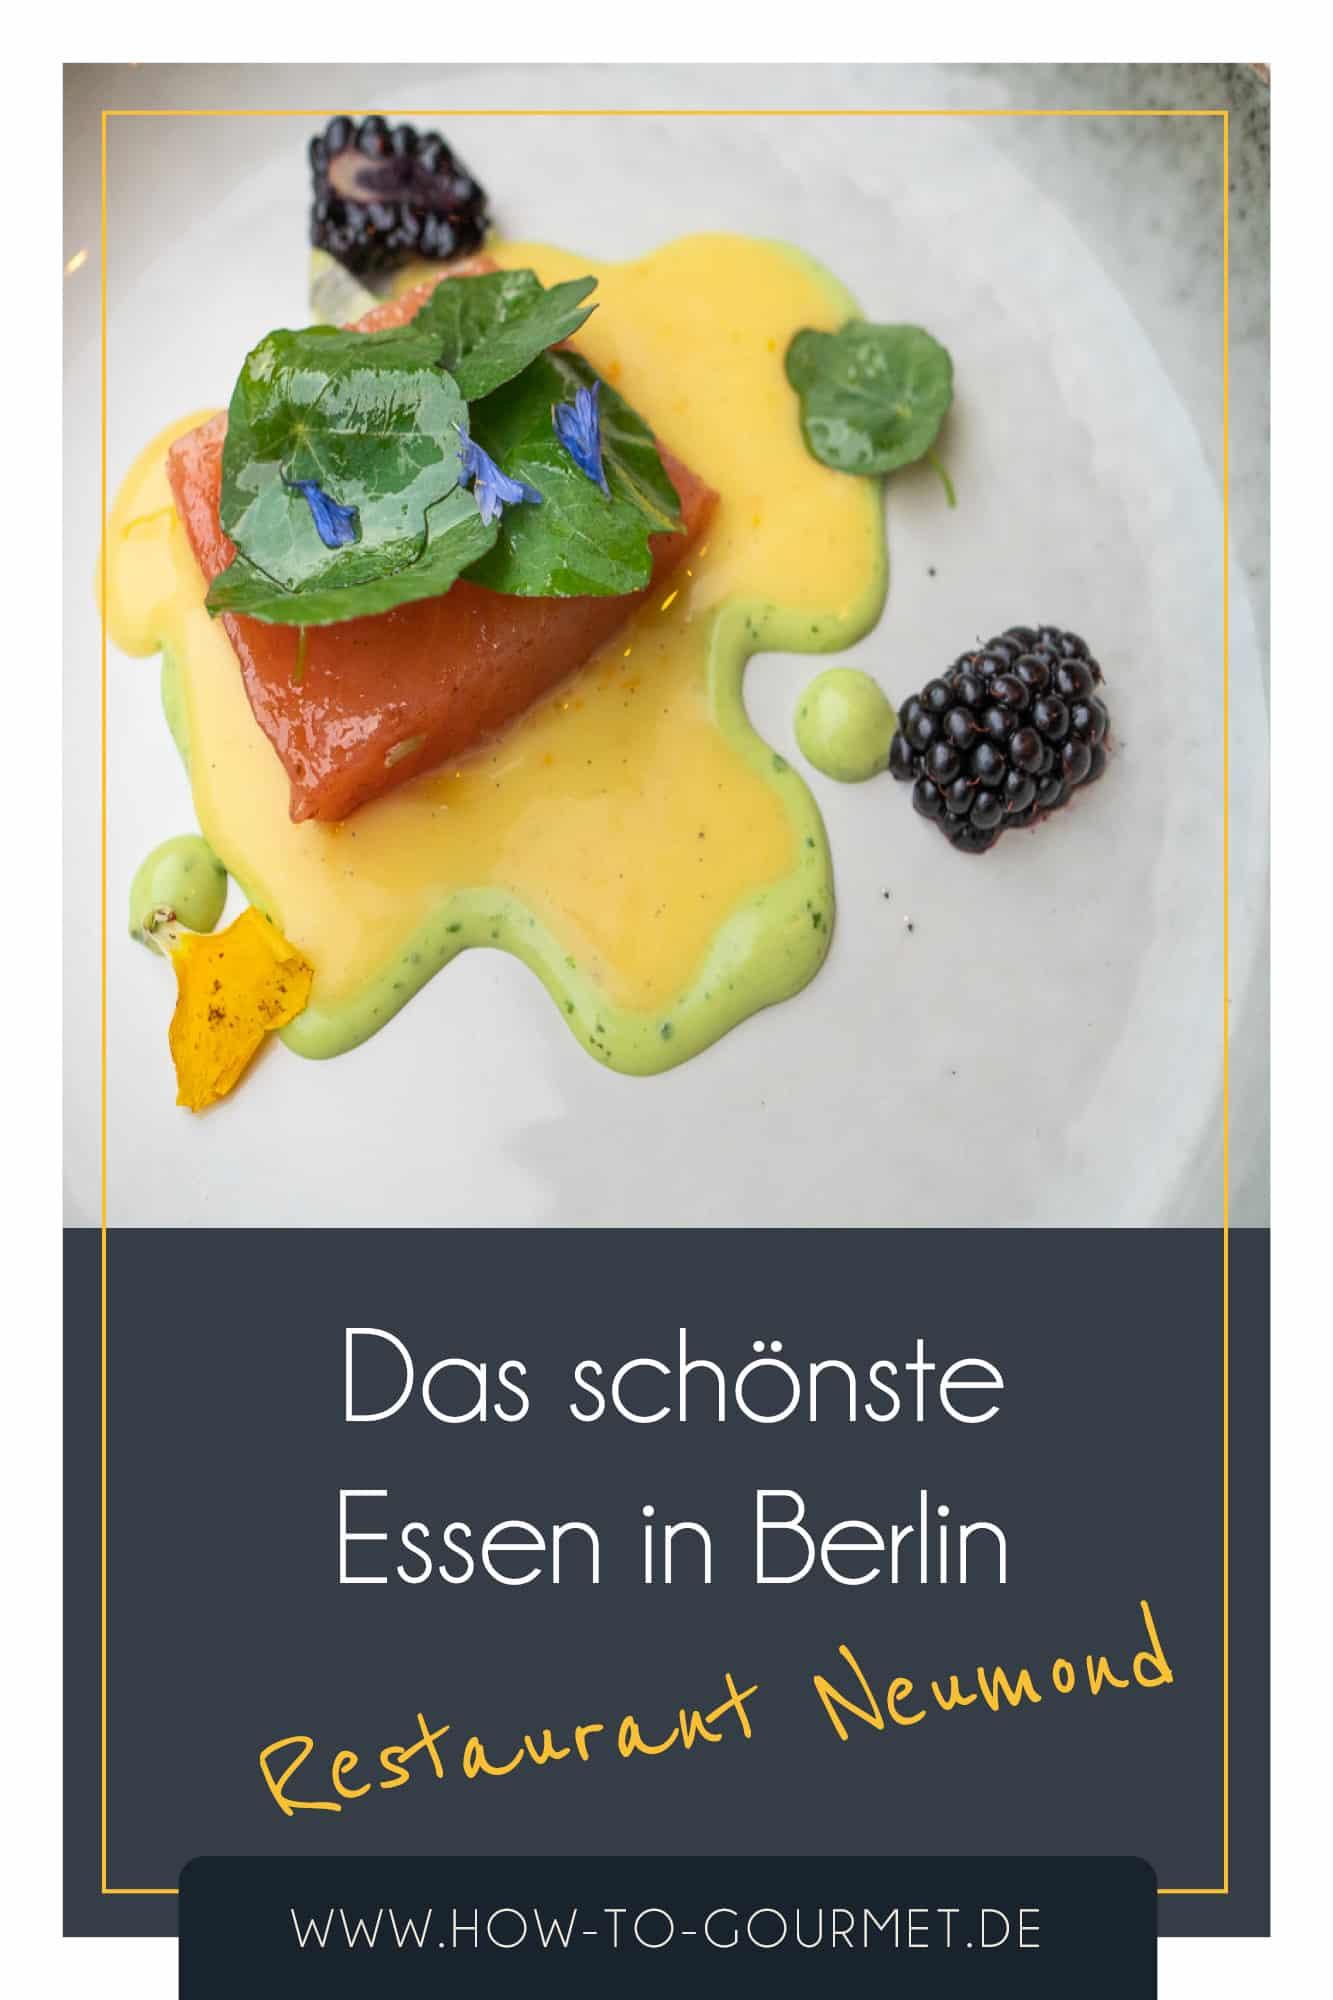 berlin neumond